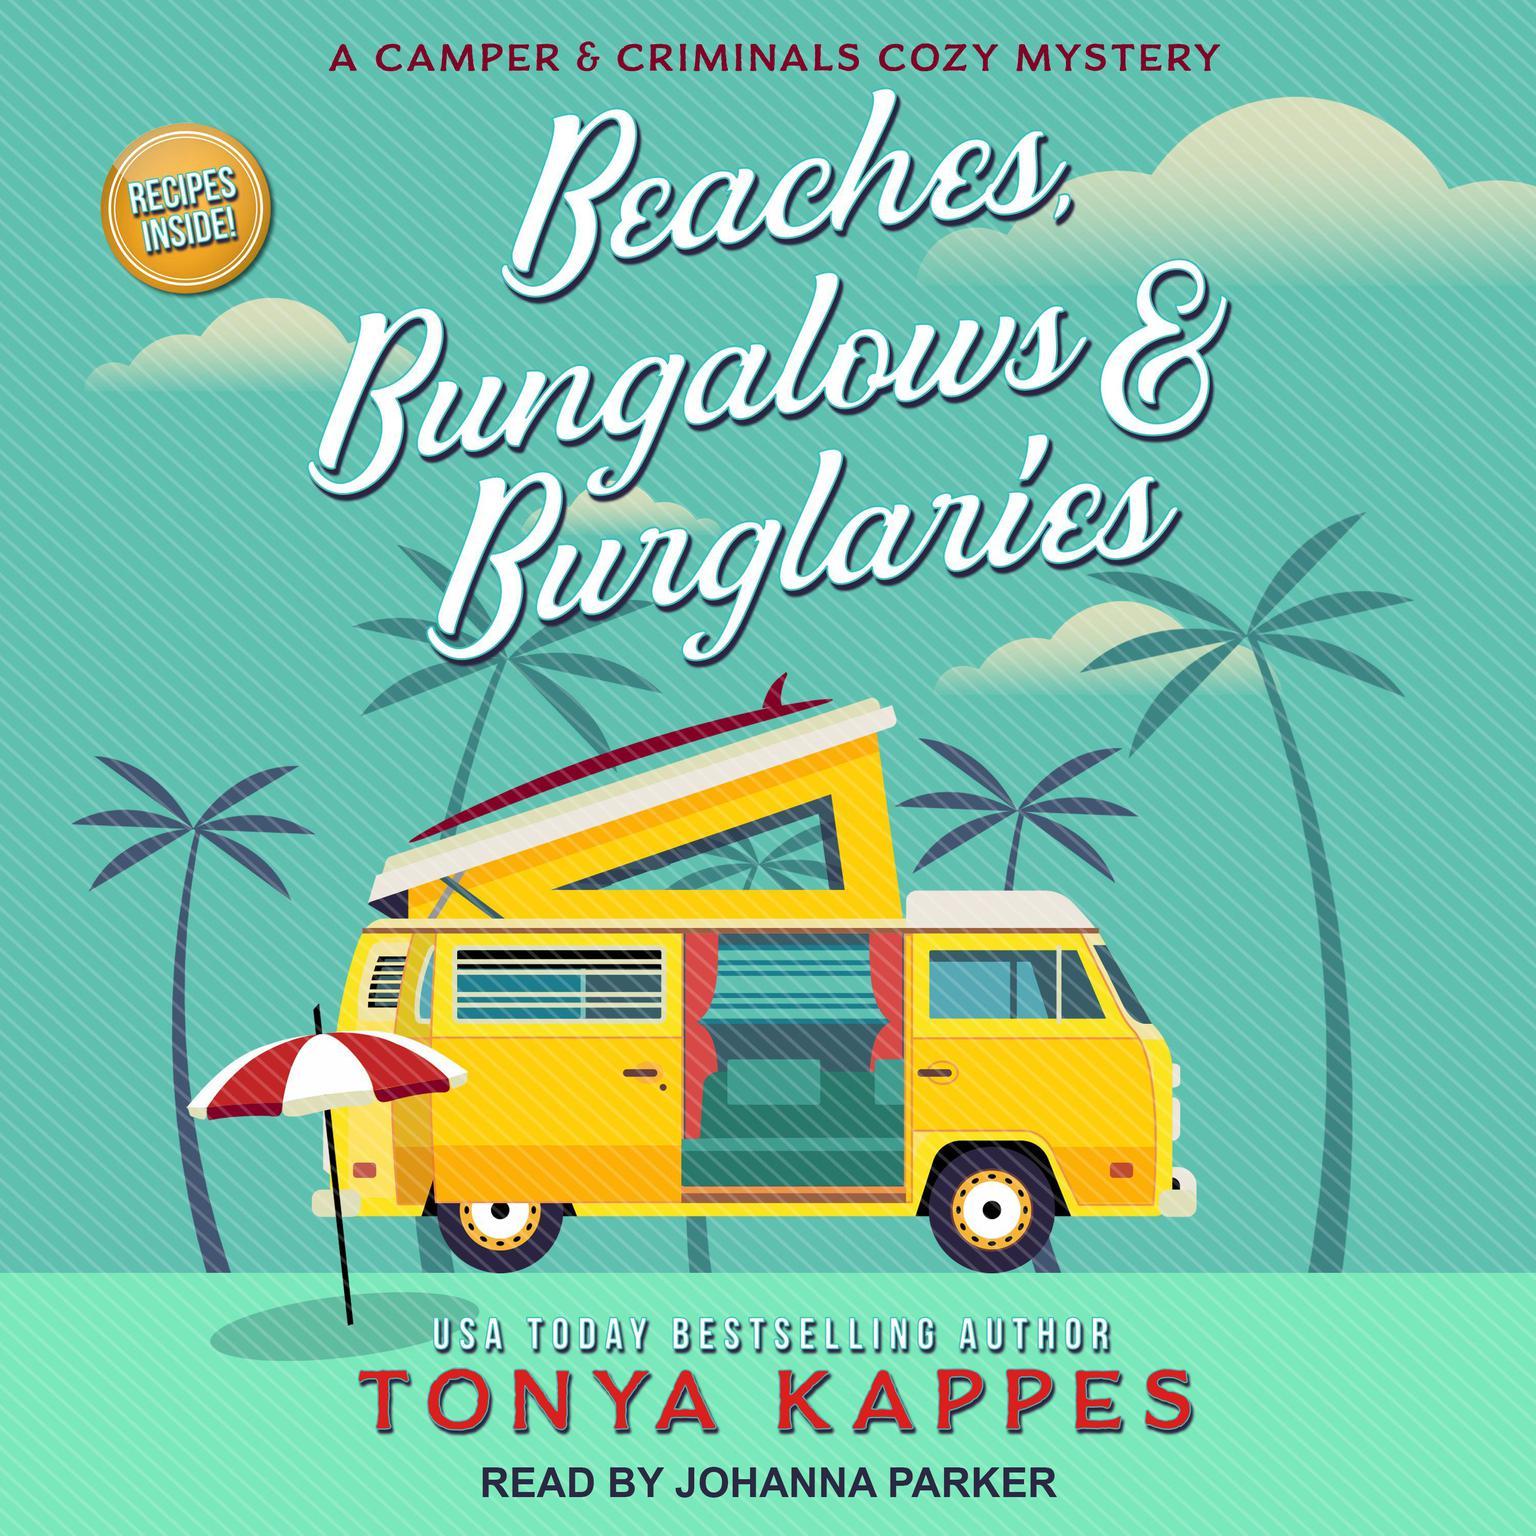 Beaches, Bungalows & Burglaries Audiobook, by Tonya Kappes